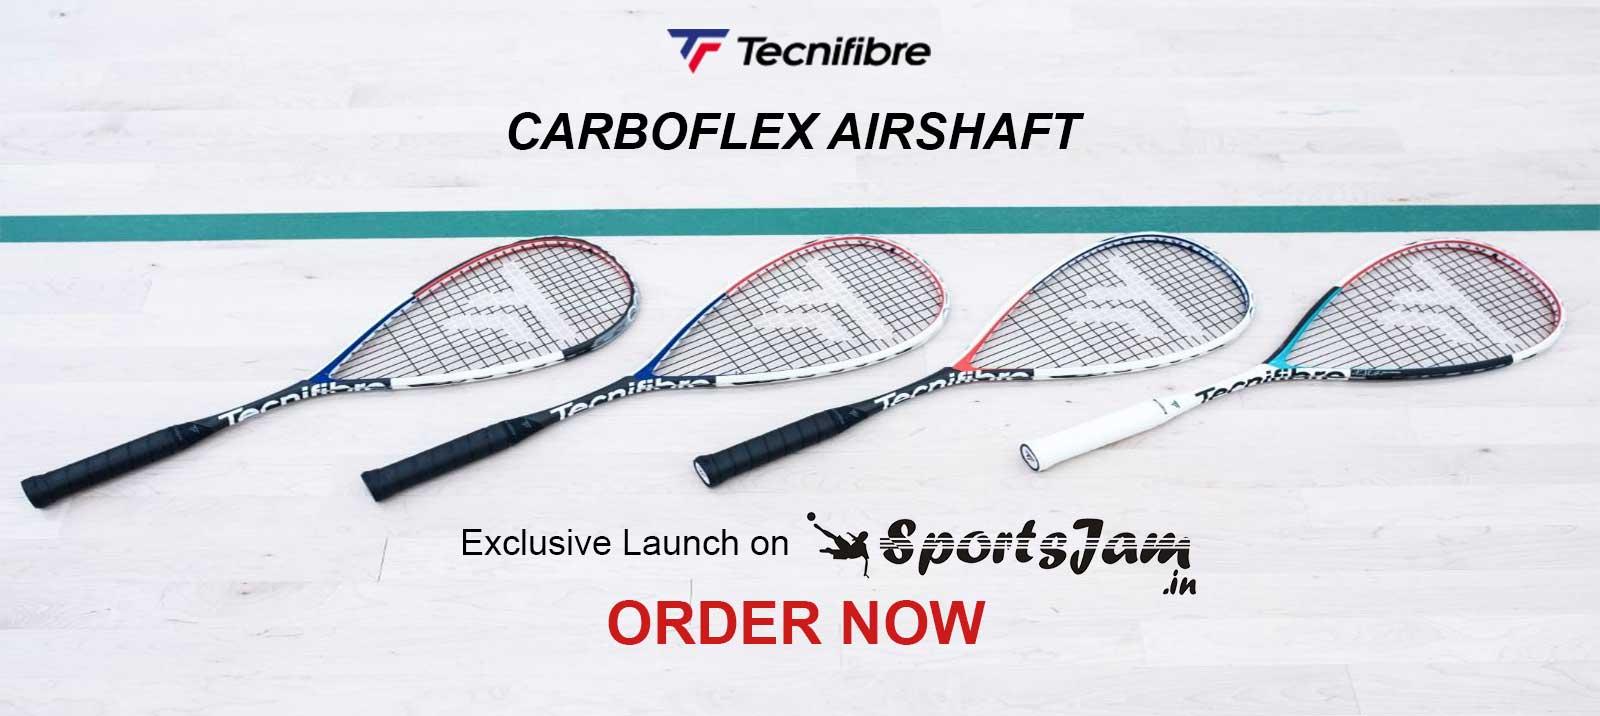 Tecnifibre Carboflex Airshaft Series